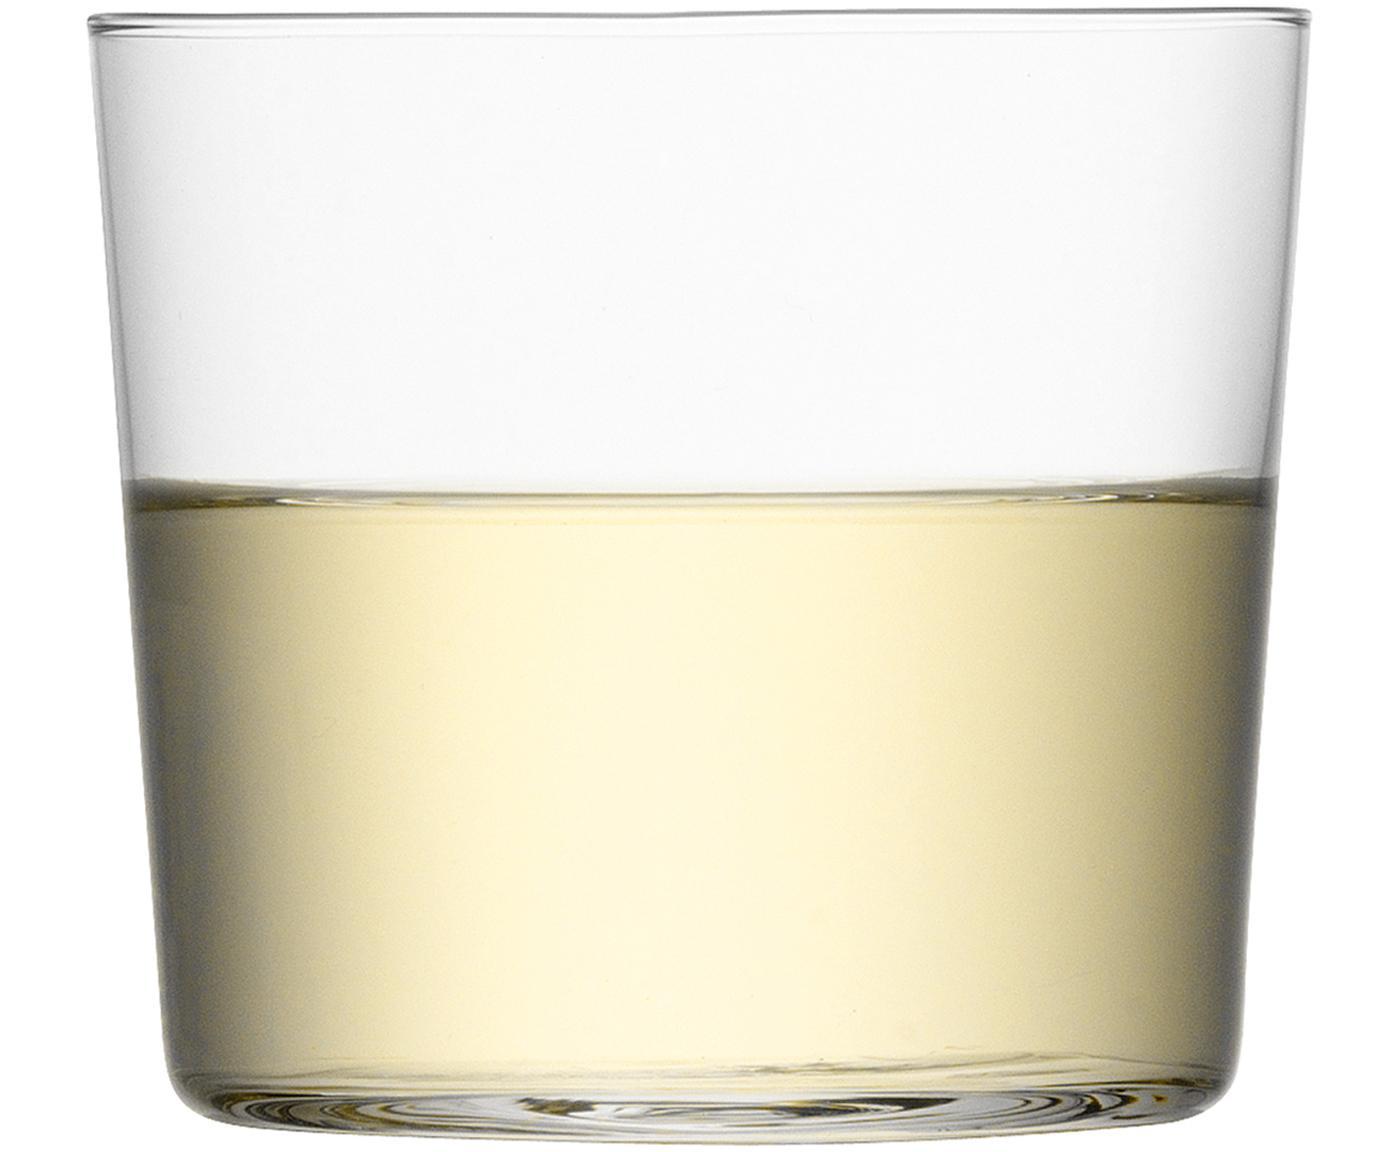 Waterglazen Gio, 6 stuks, Glas, Transparant, Ø 8 x H 7 cm